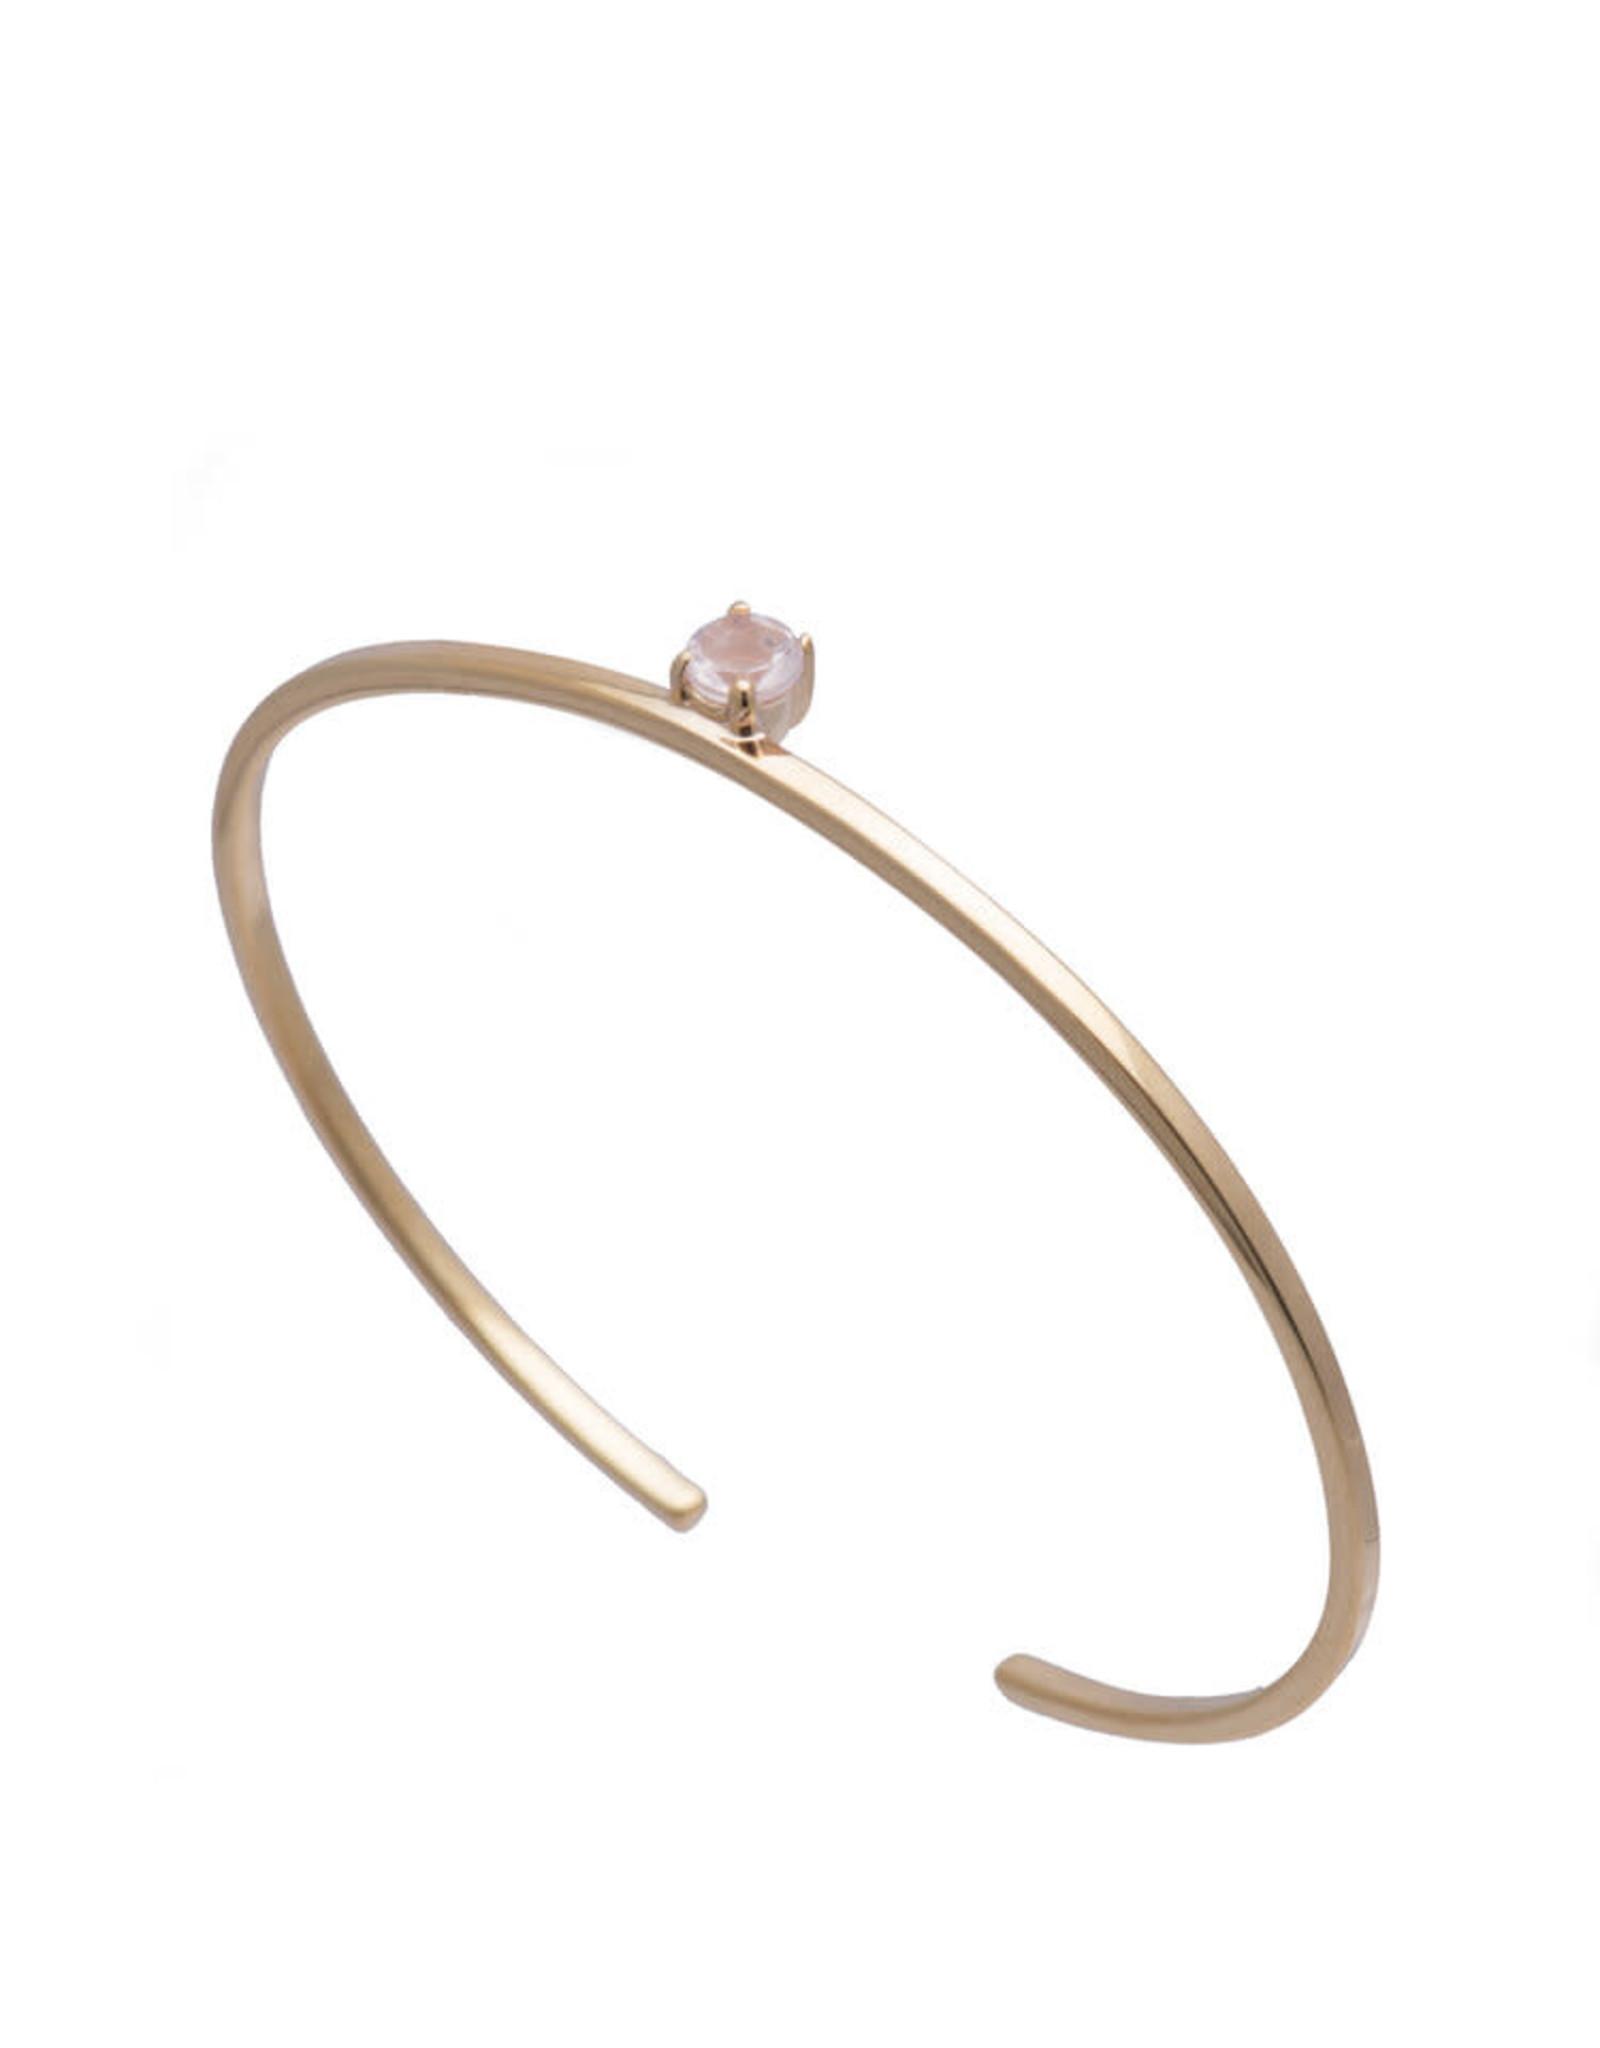 Sarah Mulder Jewelry Gold Obsession Bracelet - Rose Quartz